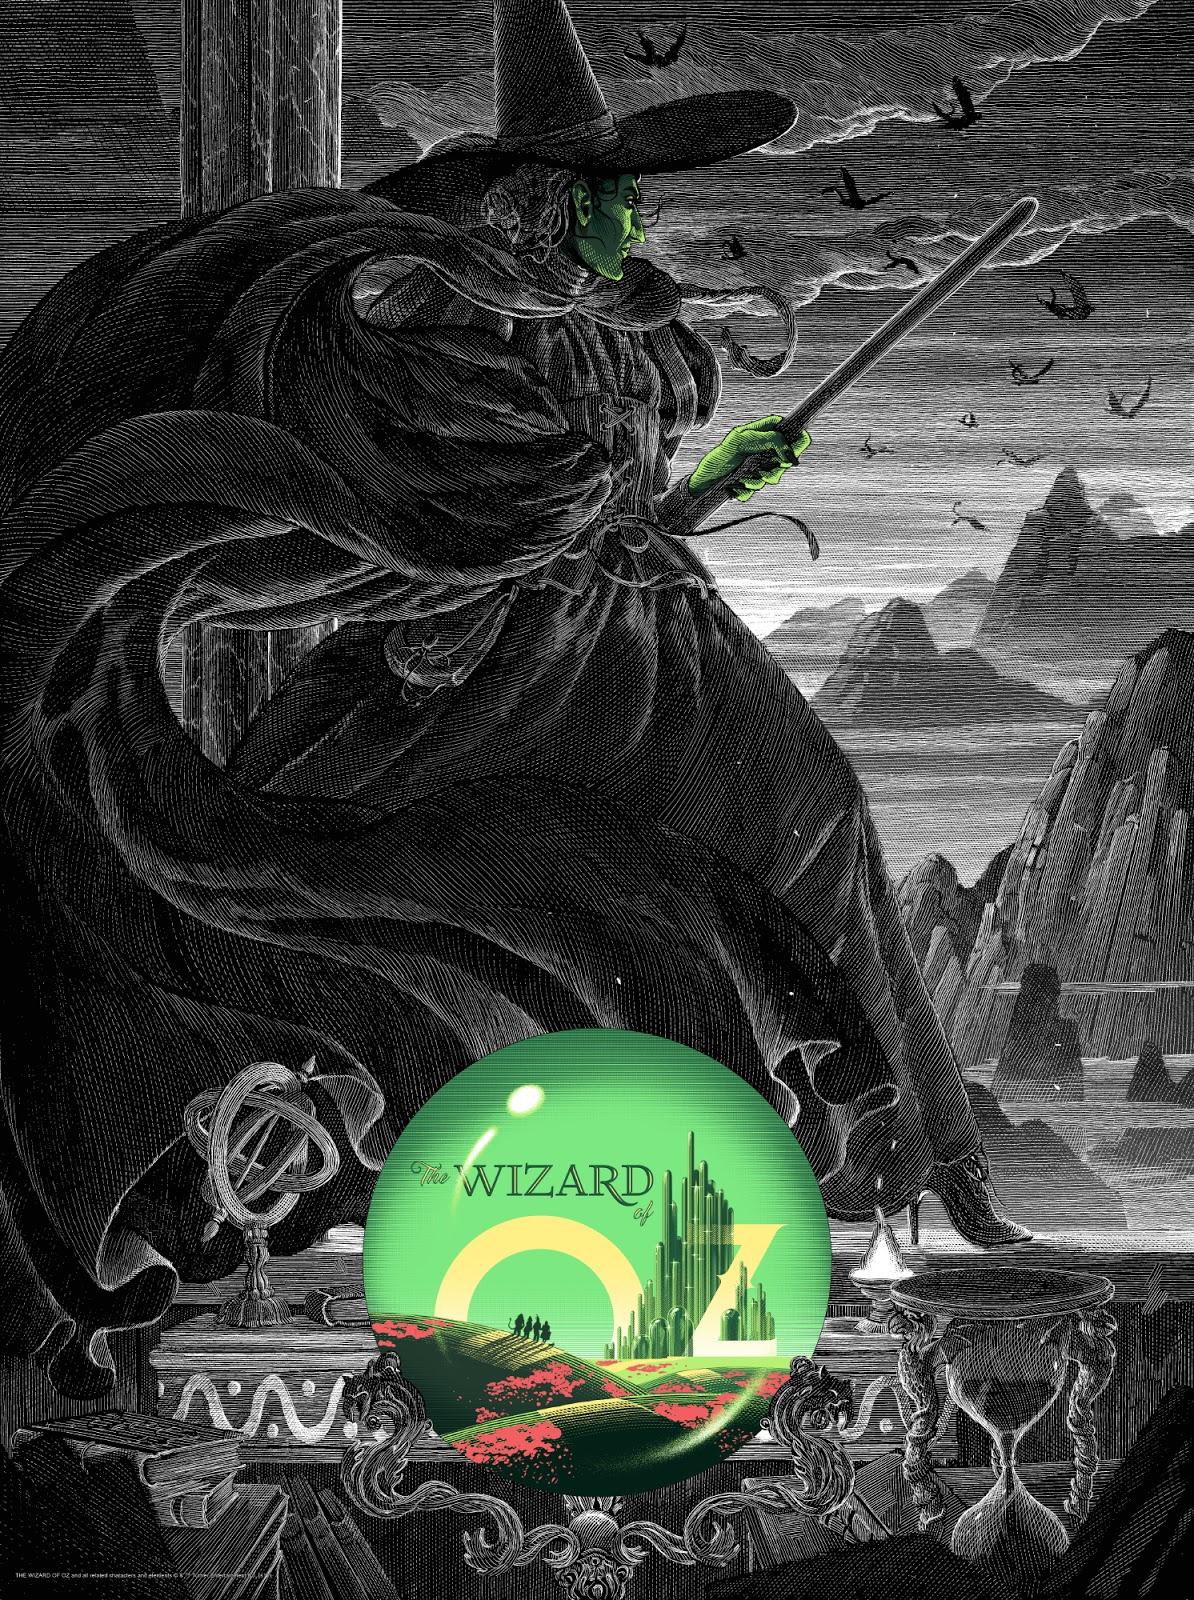 Inside The Rock Poster Frame Blog Nicolas Delort Wizard Of Oz